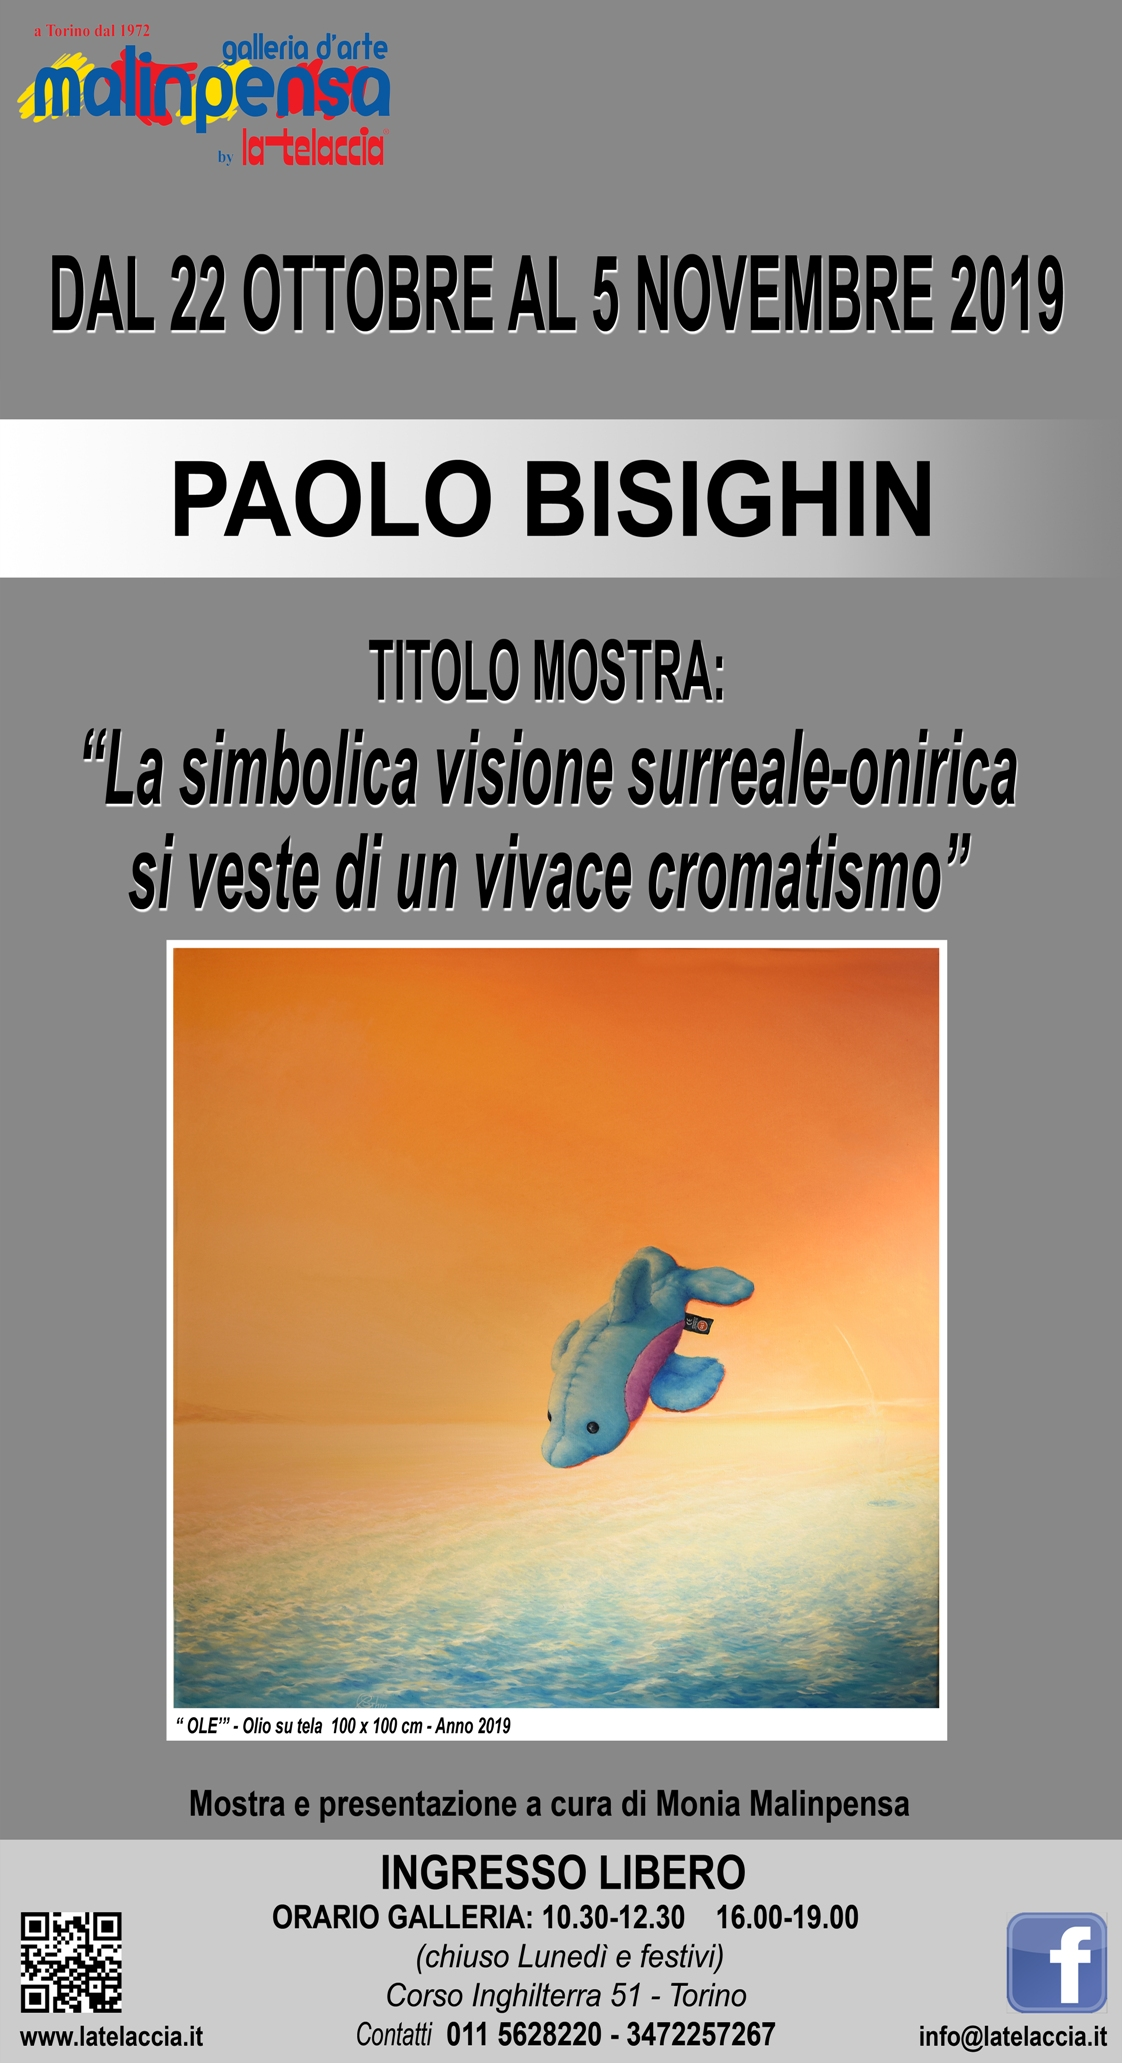 locandina_paolo_bisighin.jpg